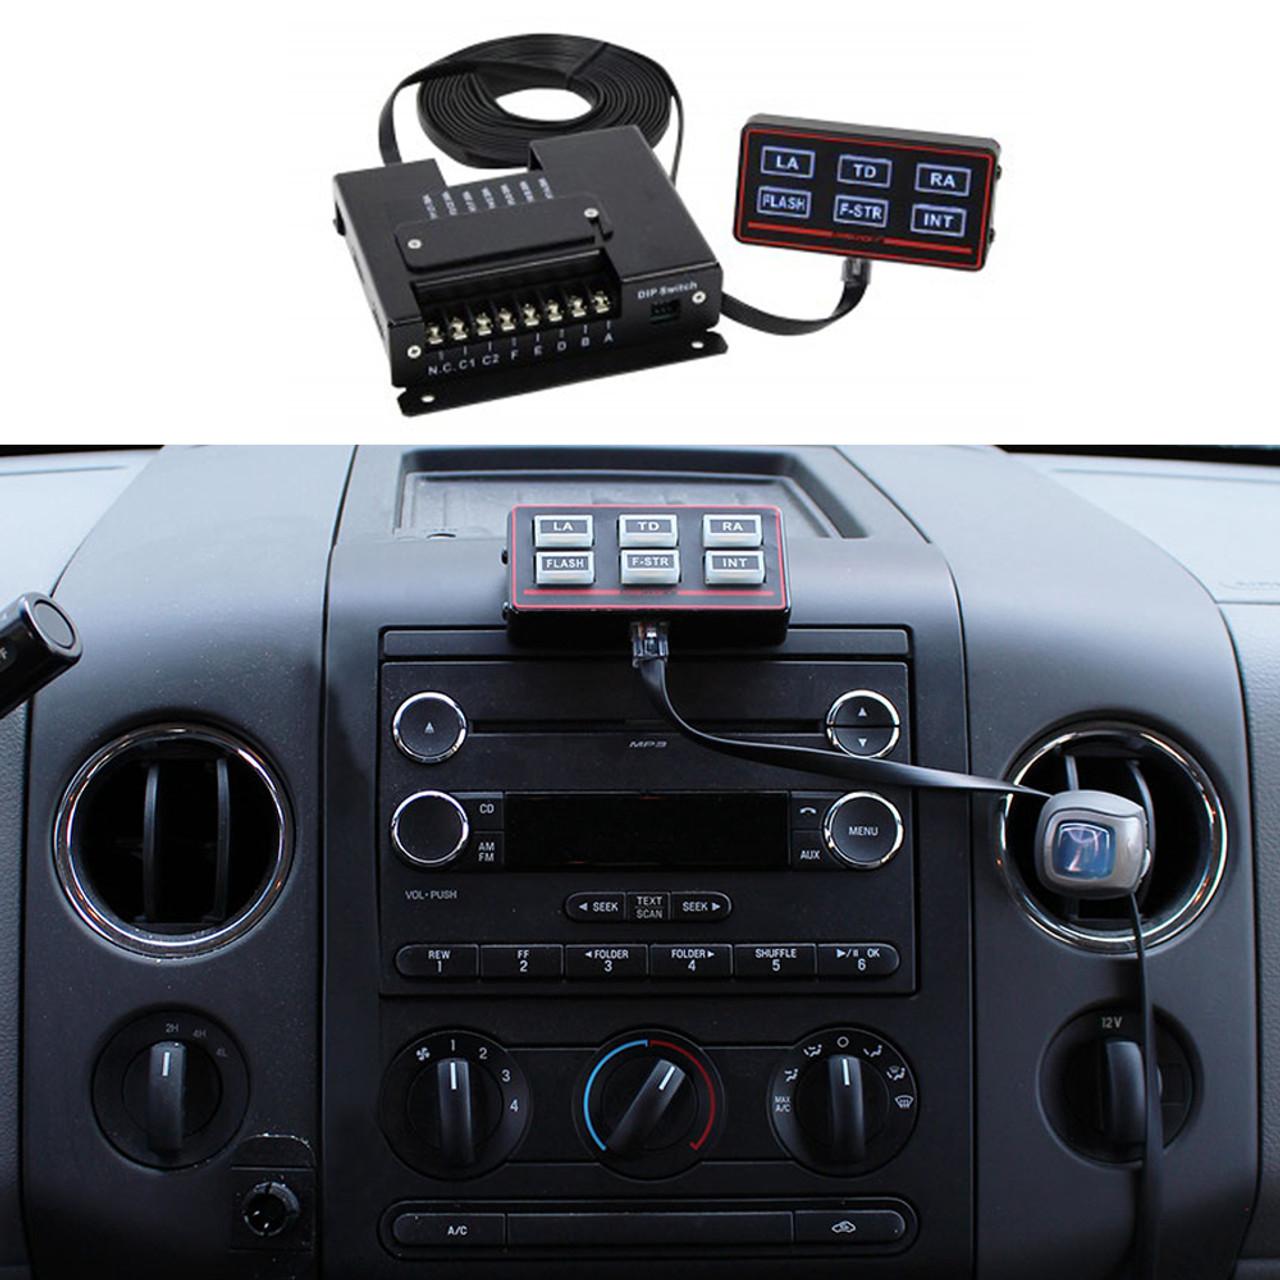 Code-3 Remote Rocker Max Pak™ Switch Box, Programmable, 6 Backlit Button Control Head